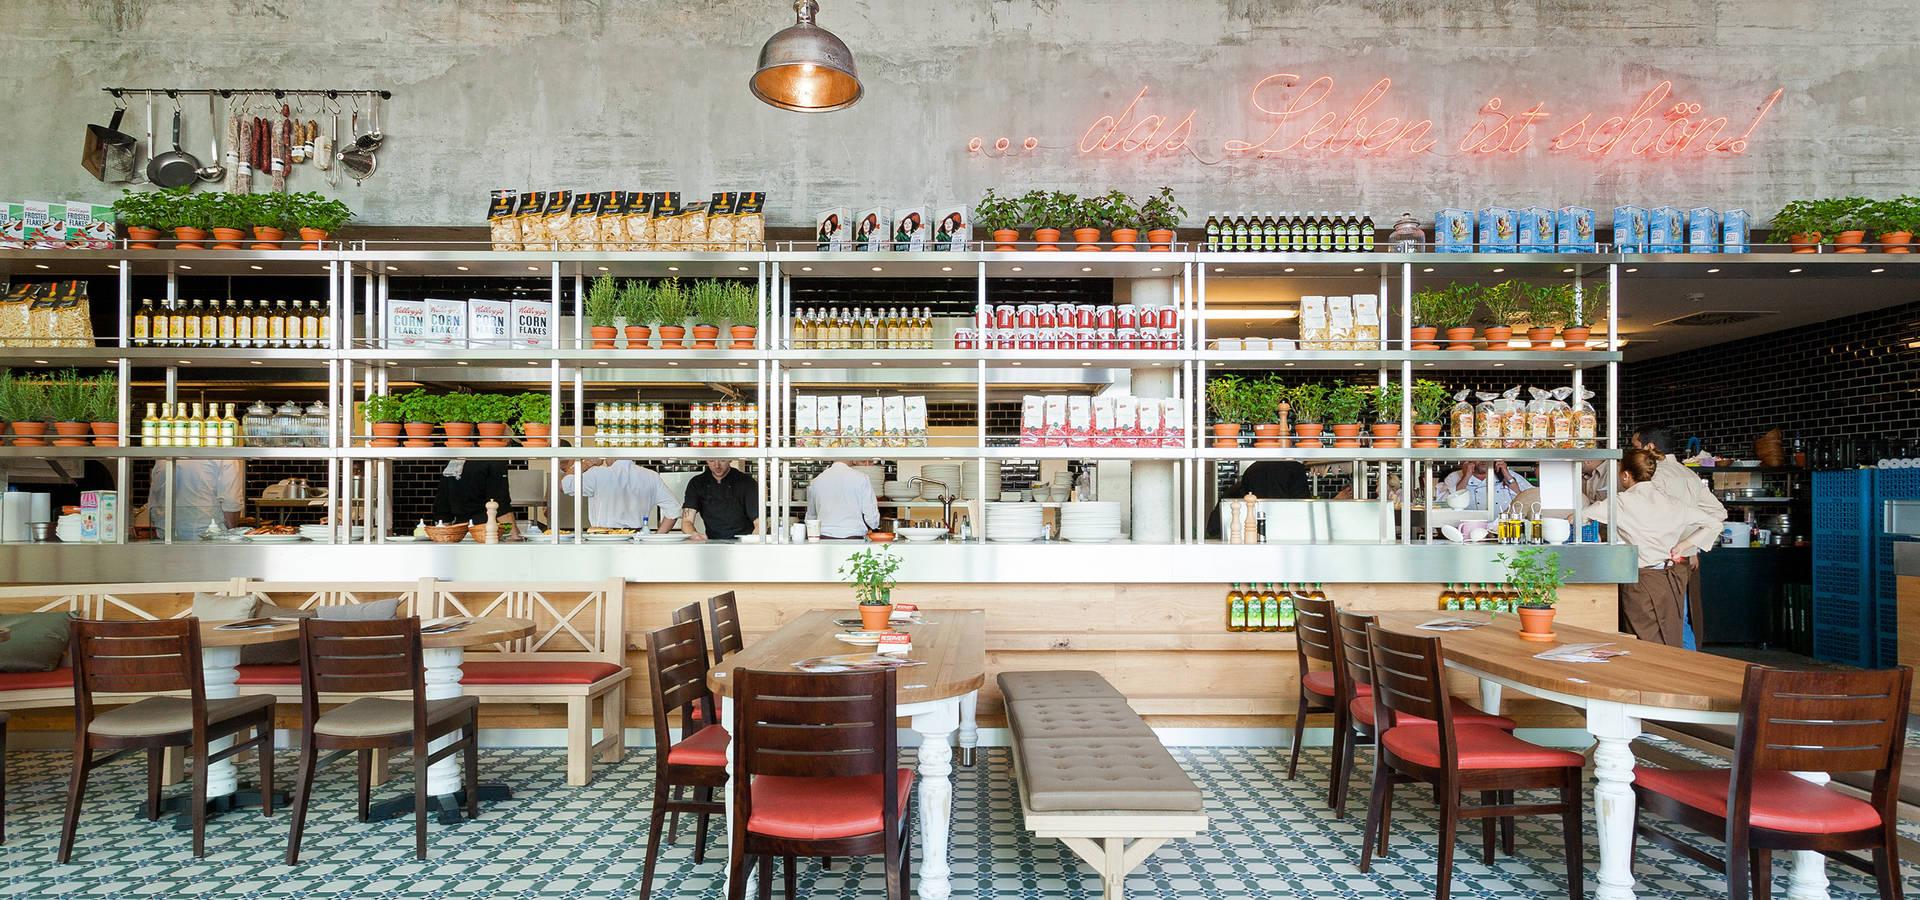 alex restaurant skyline plaza by p m furniture homify. Black Bedroom Furniture Sets. Home Design Ideas